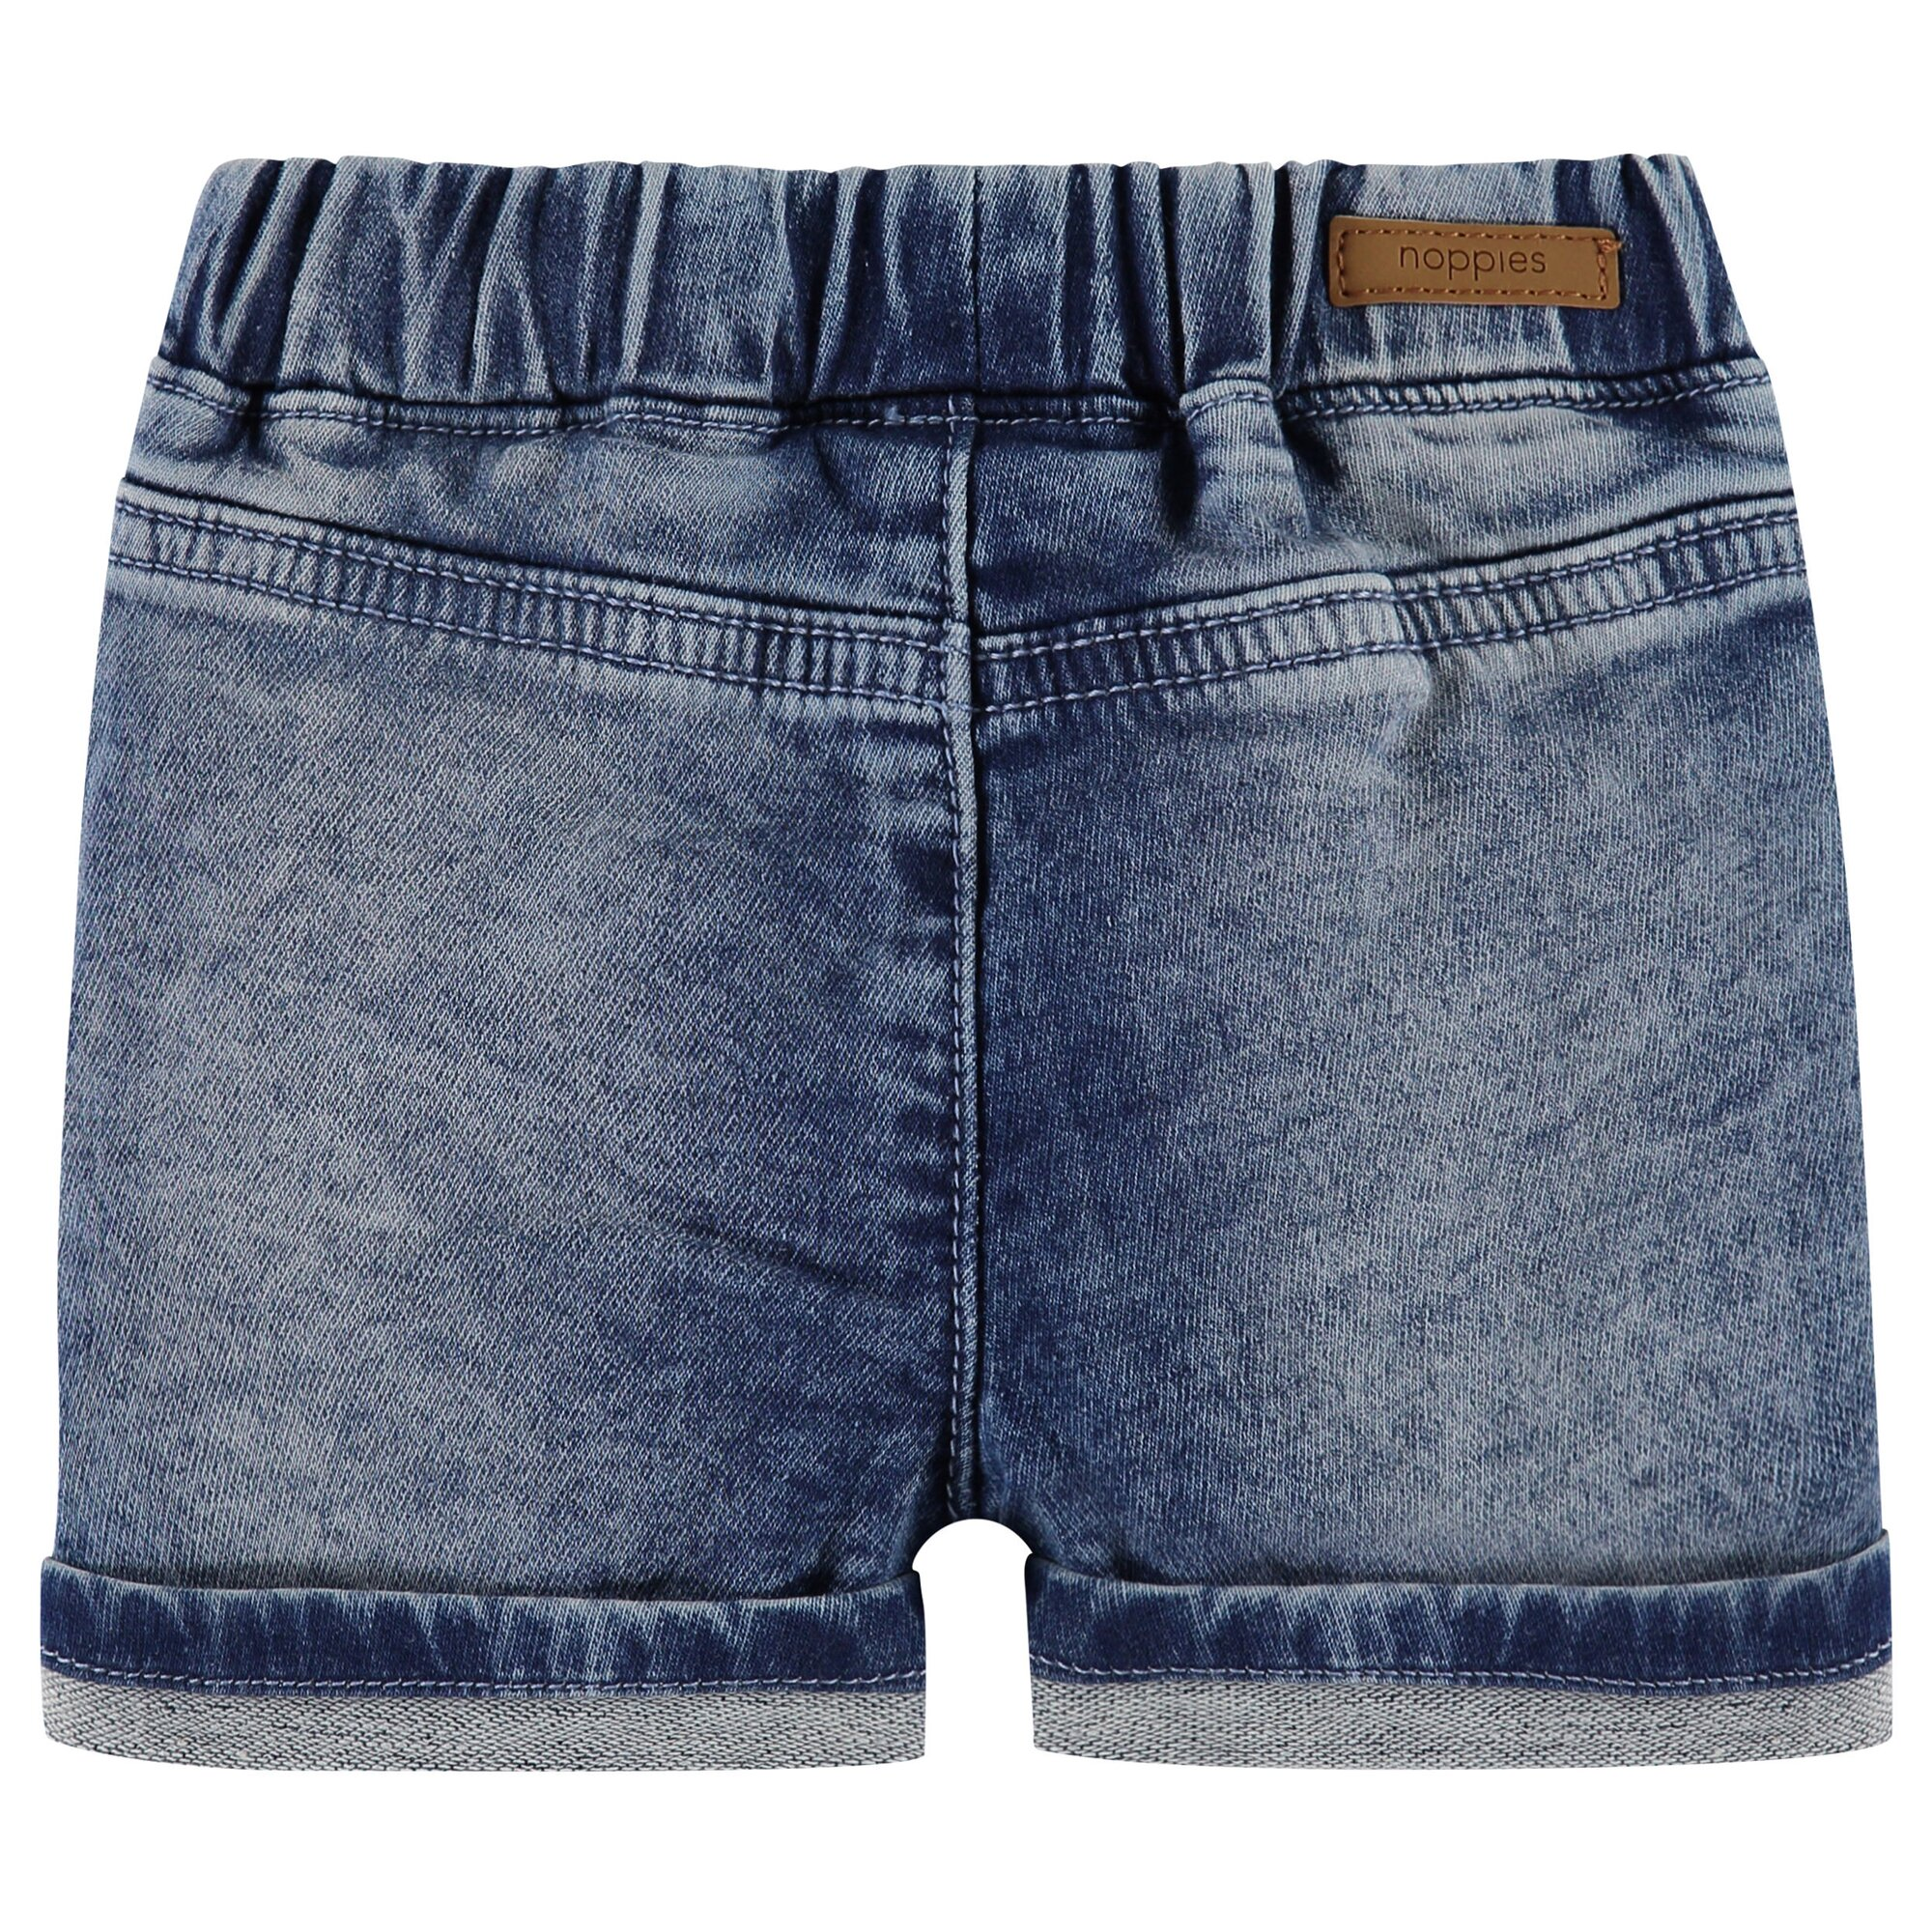 noppies-shorts-sudbury